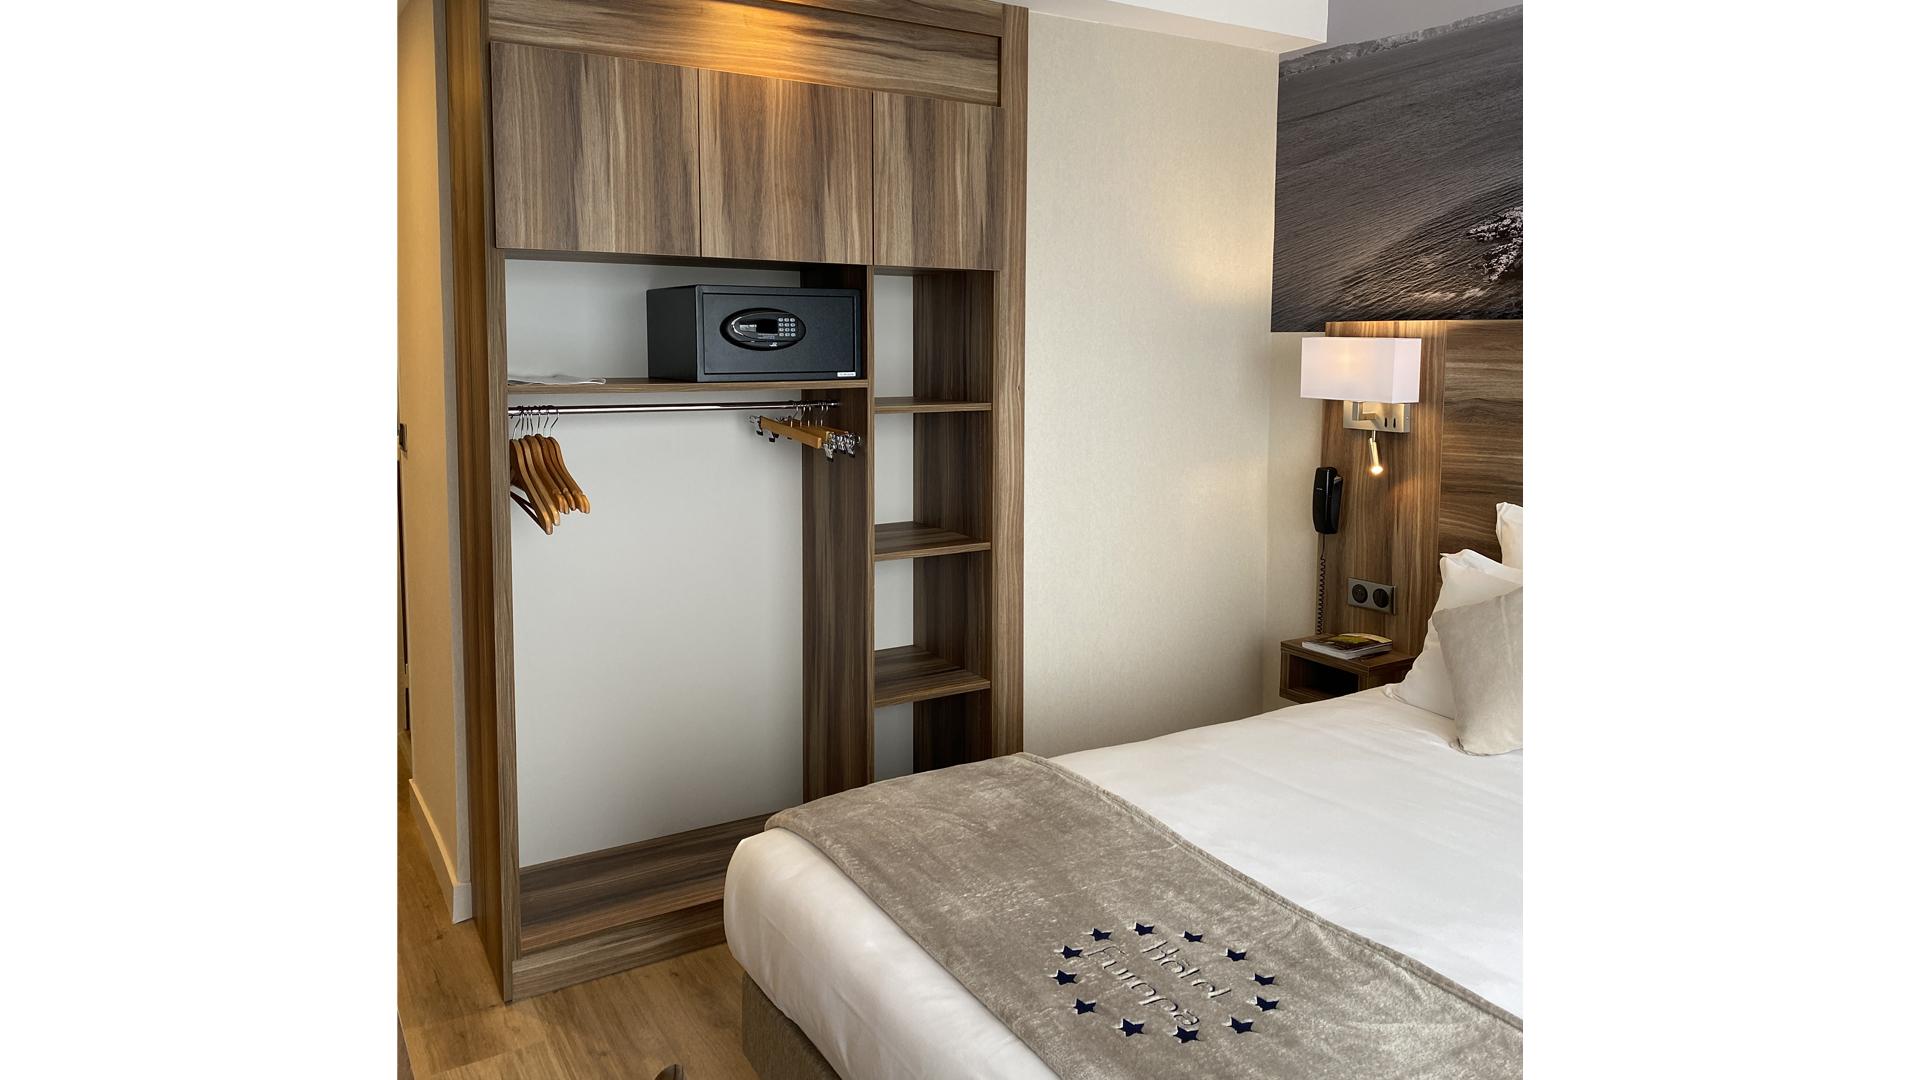 hotel-chambre-elegance-vue-jardin-quiberon-hotel-europa-diaporama2020-3